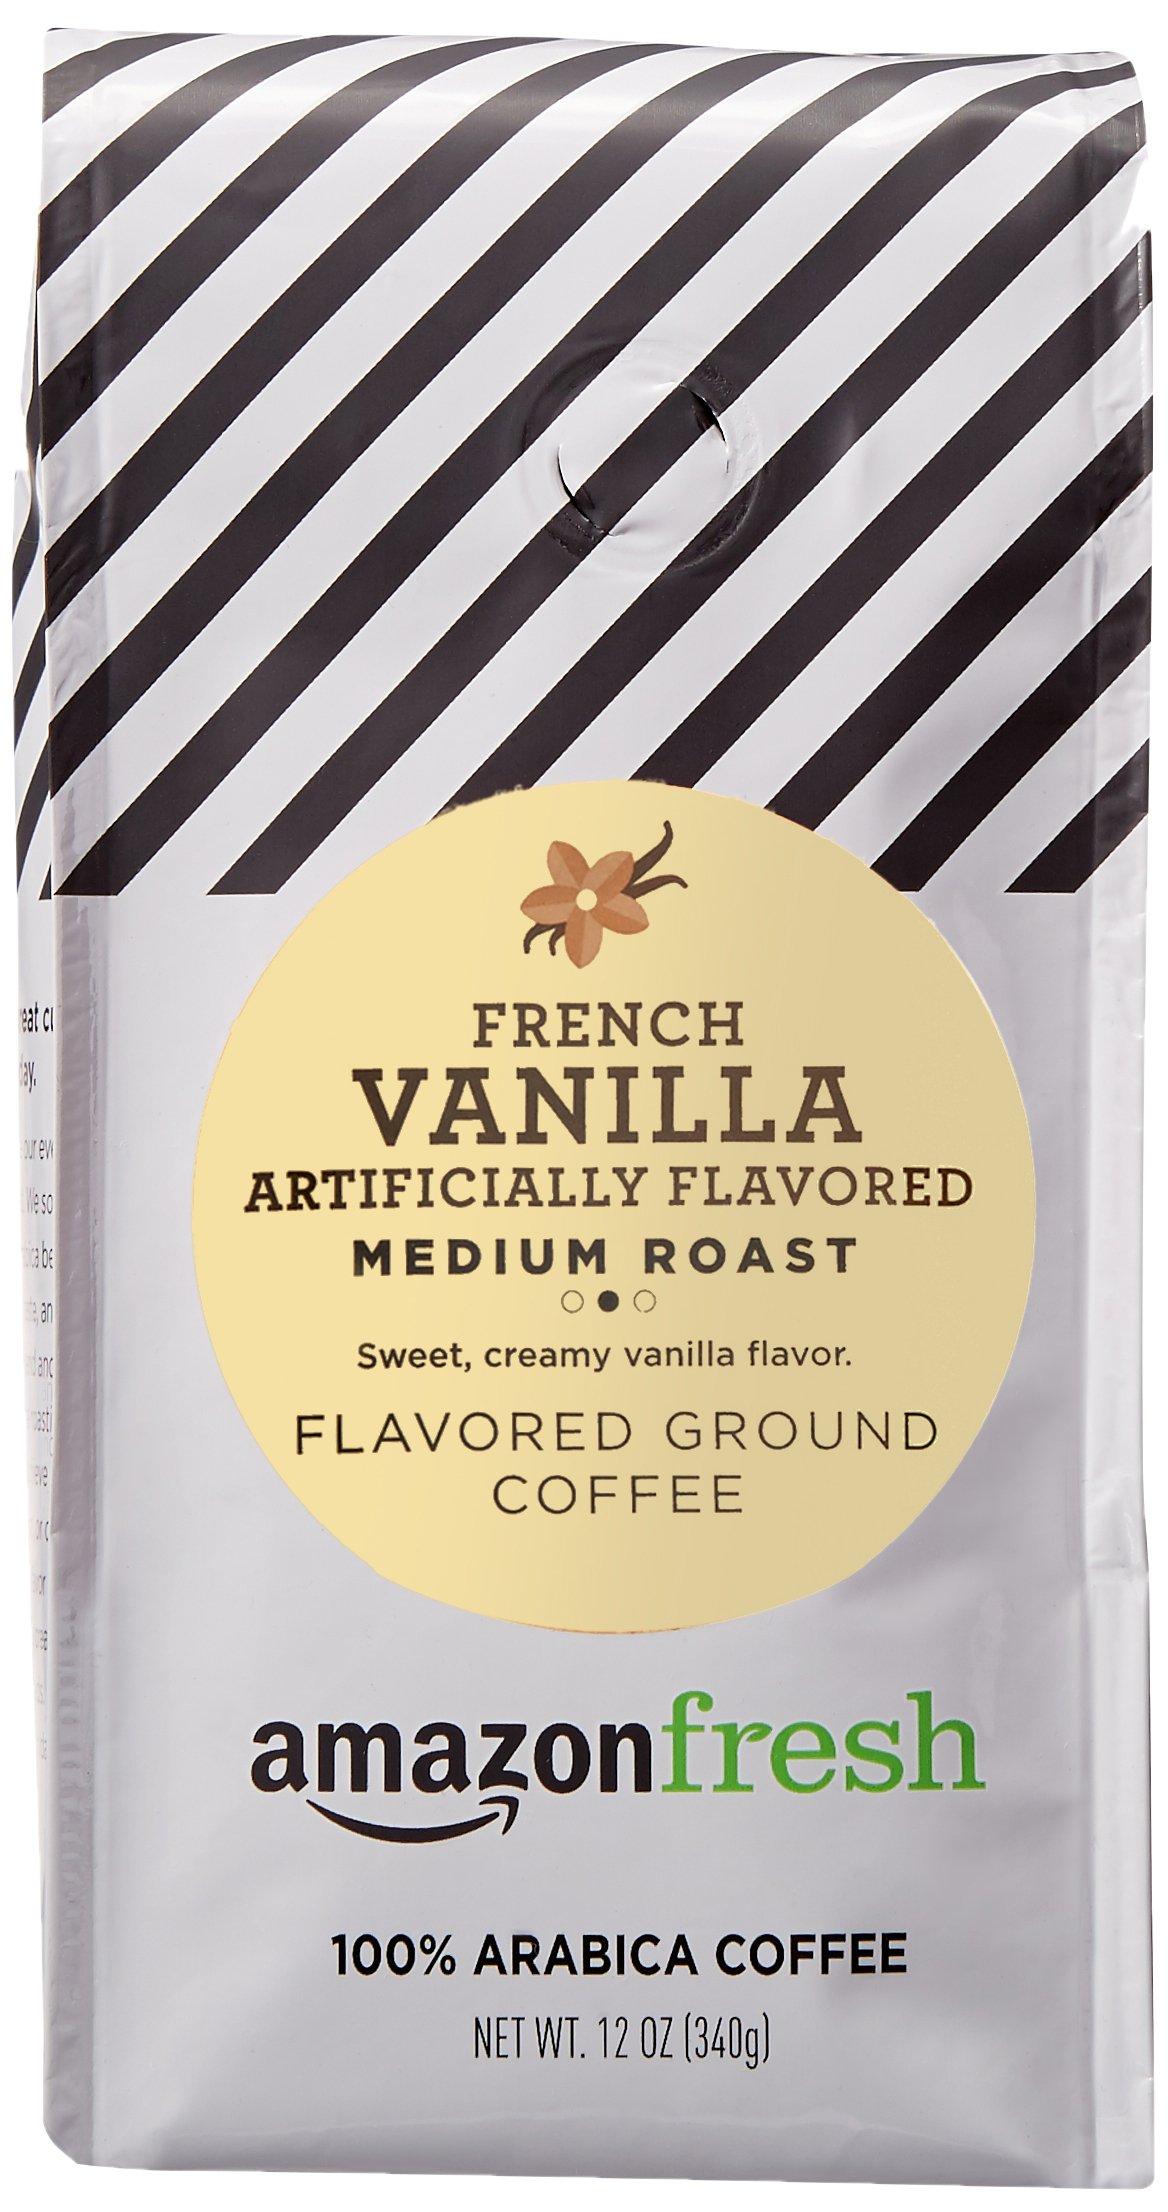 AmazonFresh French Vanilla Flavored Coffee, Ground, Medium Roast, 12 Ounce